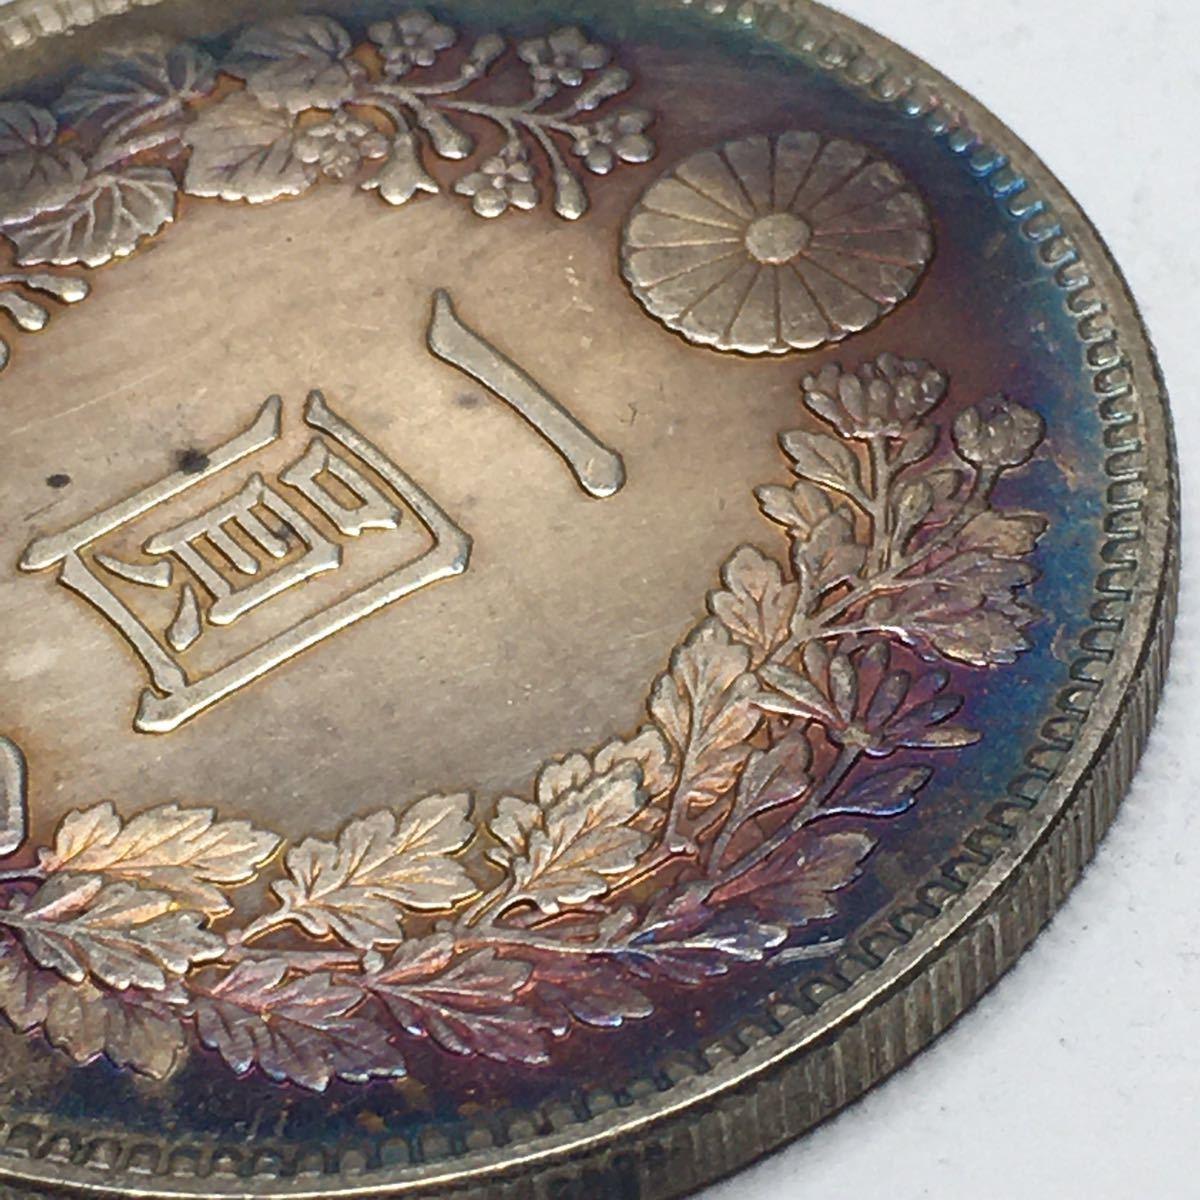 ES5-305 明治八年一円銀貨 日本古銭 量目26.45_画像3